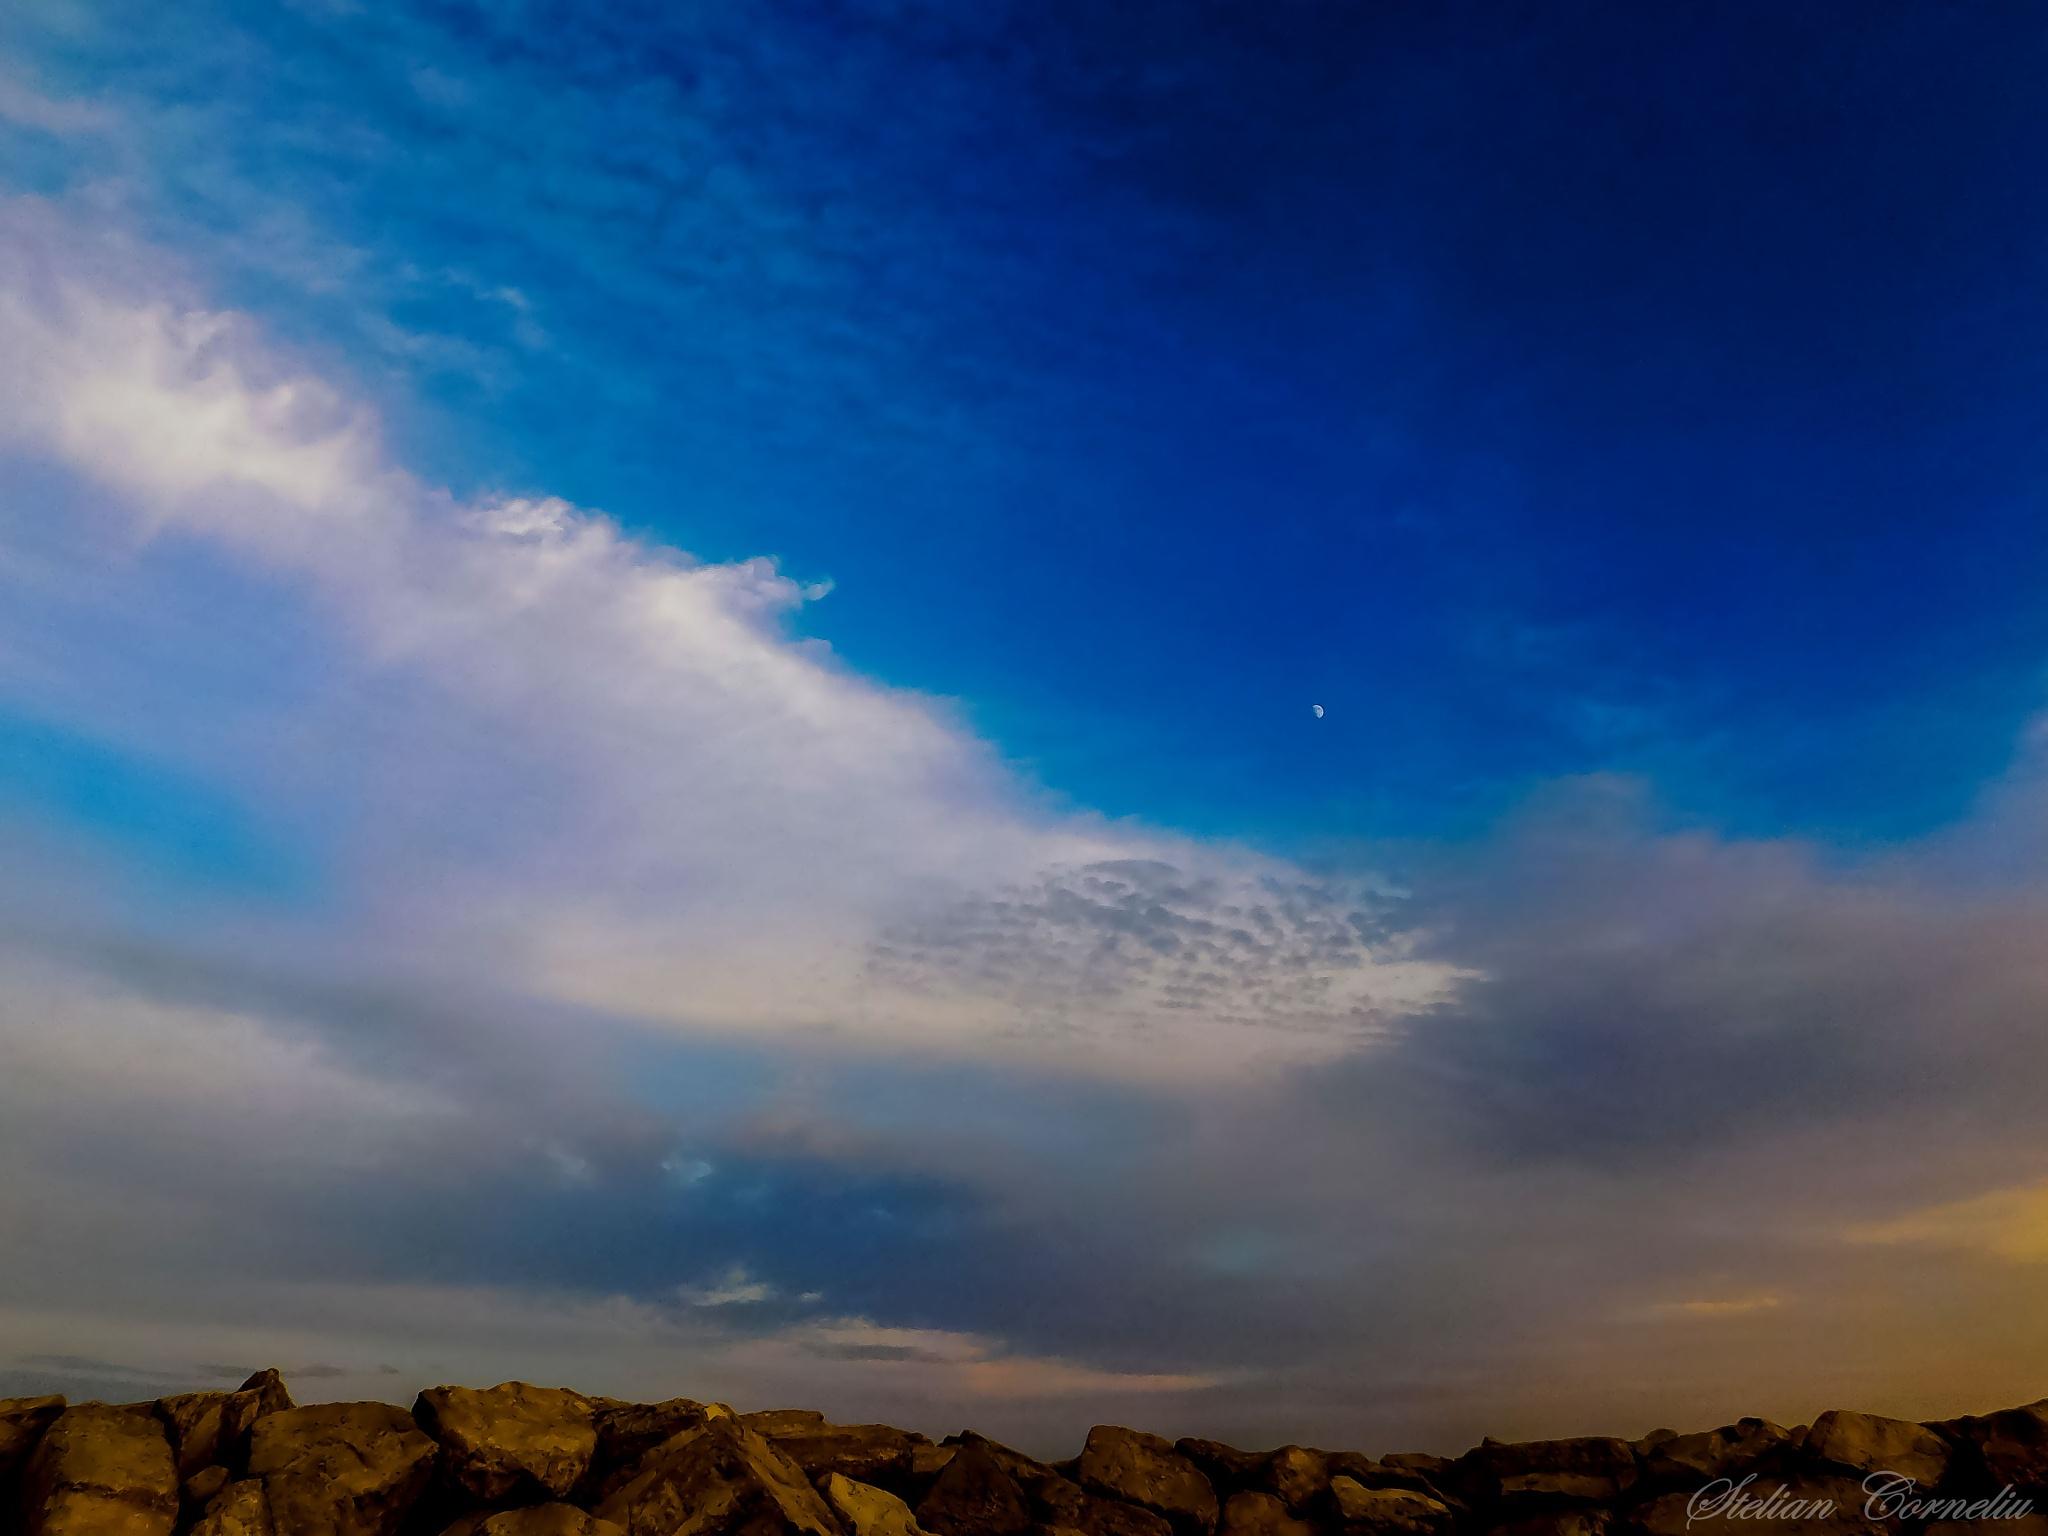 oldport sunset by Stelian Corneliu